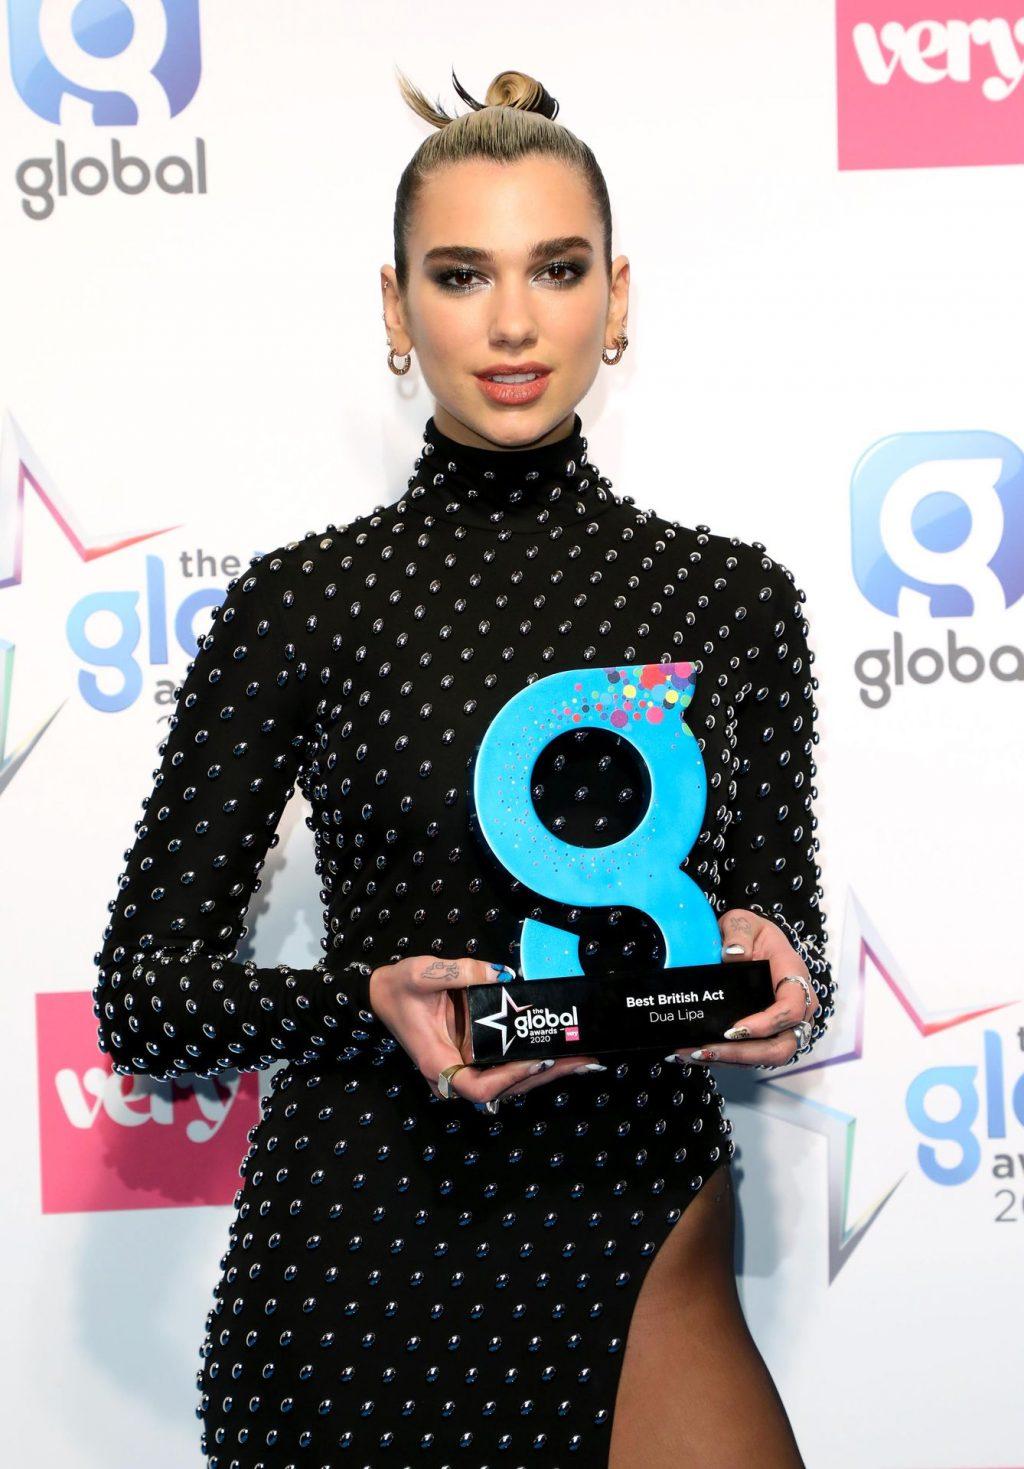 Dua Lipa Stuns at The Global Awards in London (70 Photos)